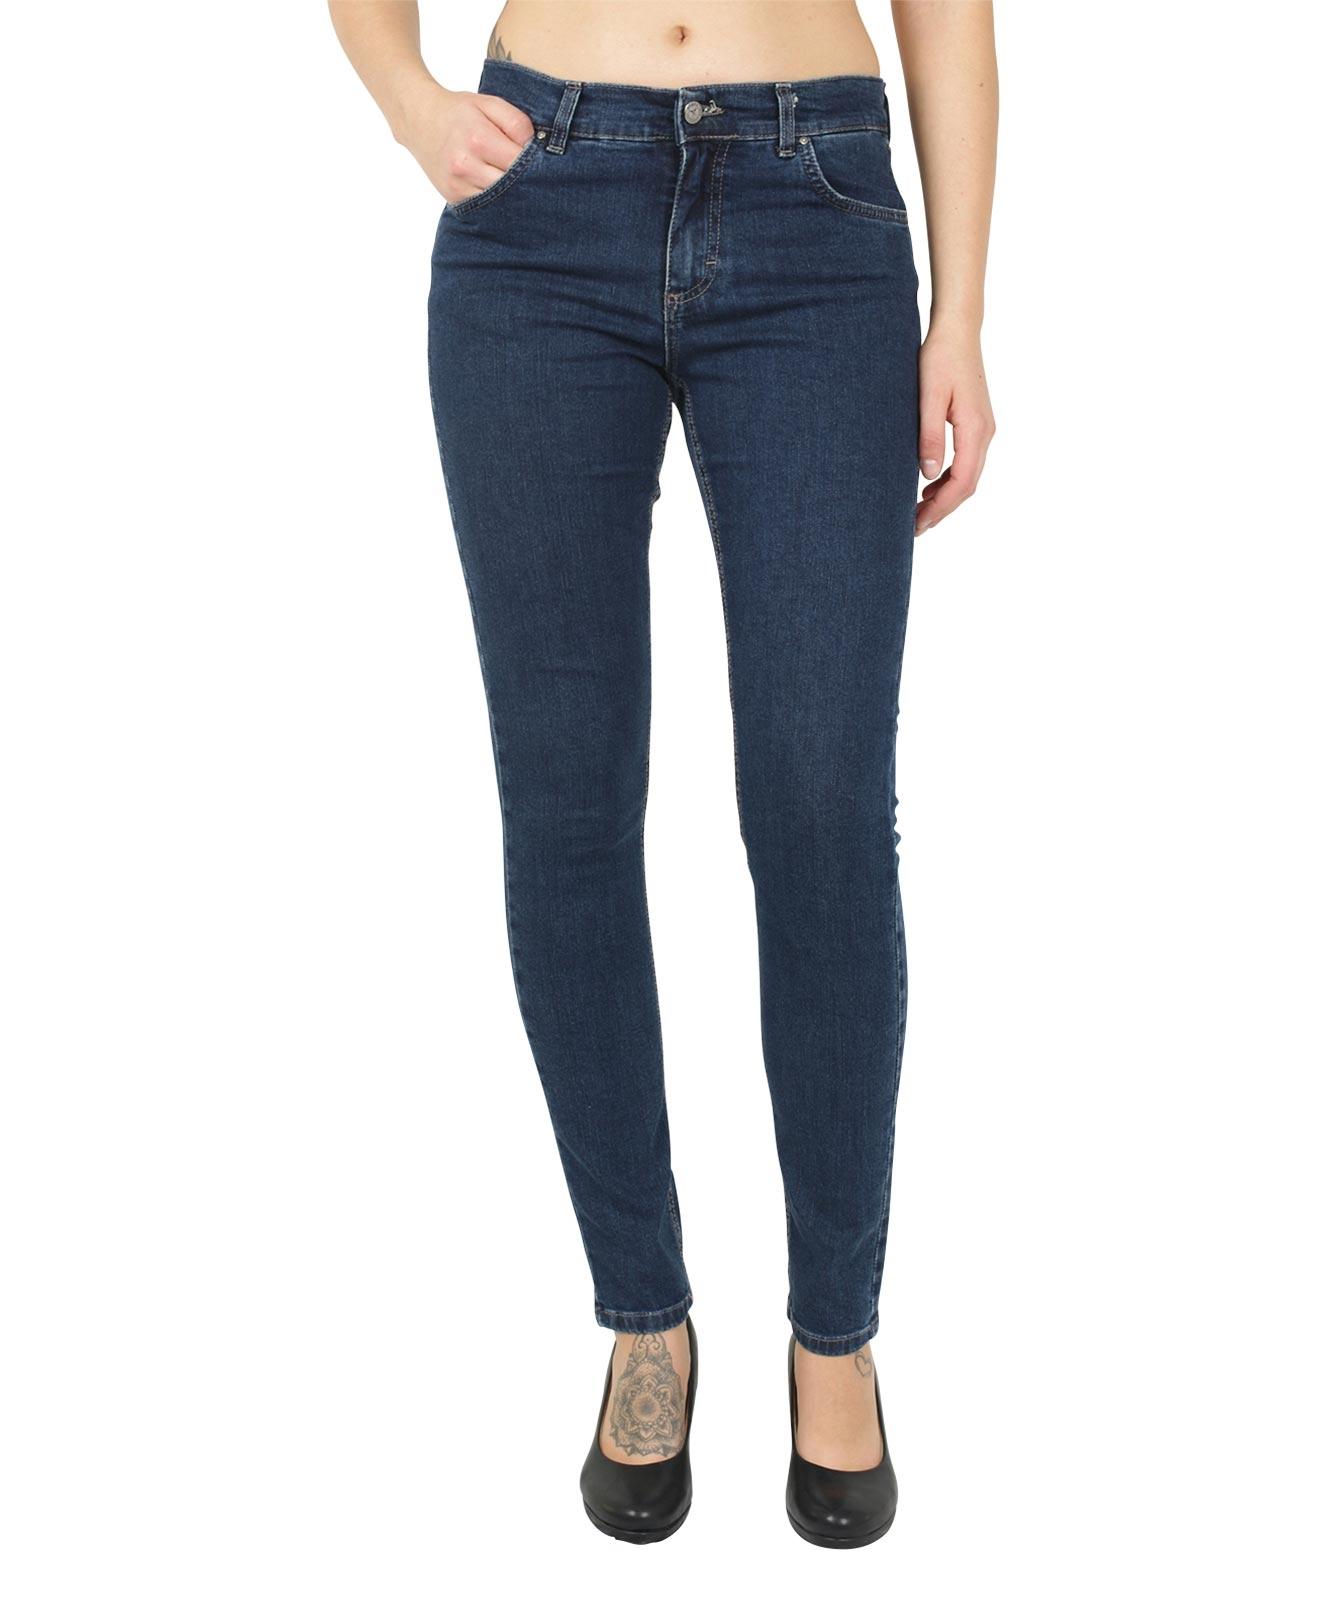 Hosen - Angels Jeans Röhre Skinny in Dark Indigo  - Onlineshop Jeans Meile